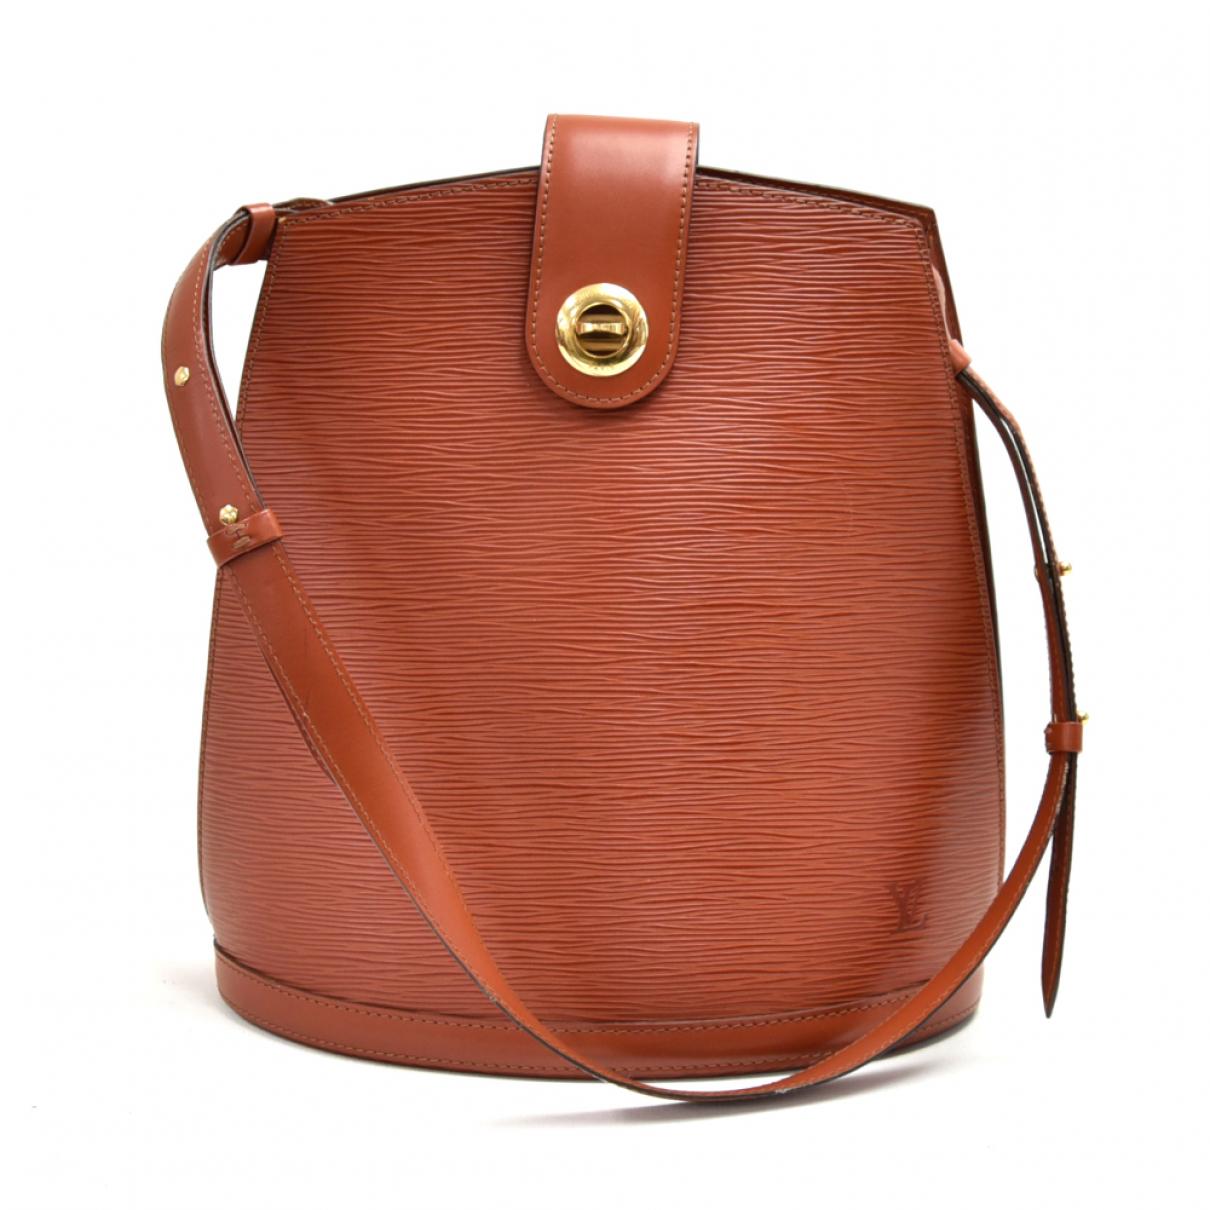 Louis Vuitton Cluny Brown Leather handbag for Women N